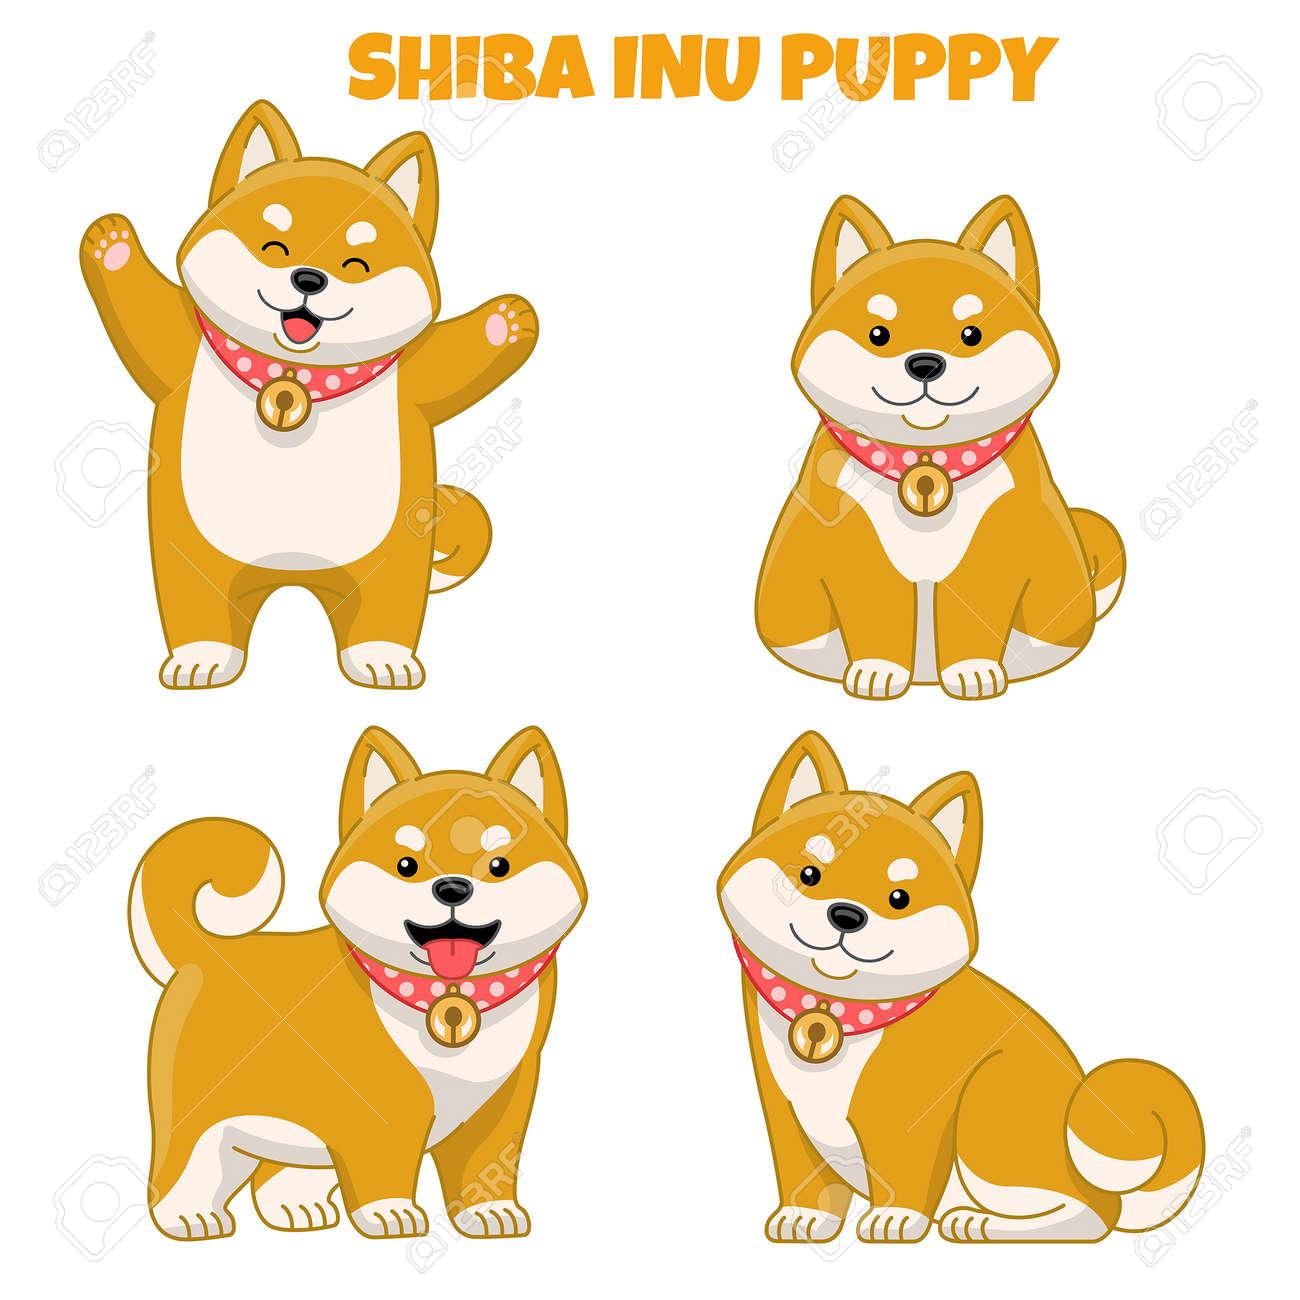 vector set of cute shiba inu puppy dog - 163987835